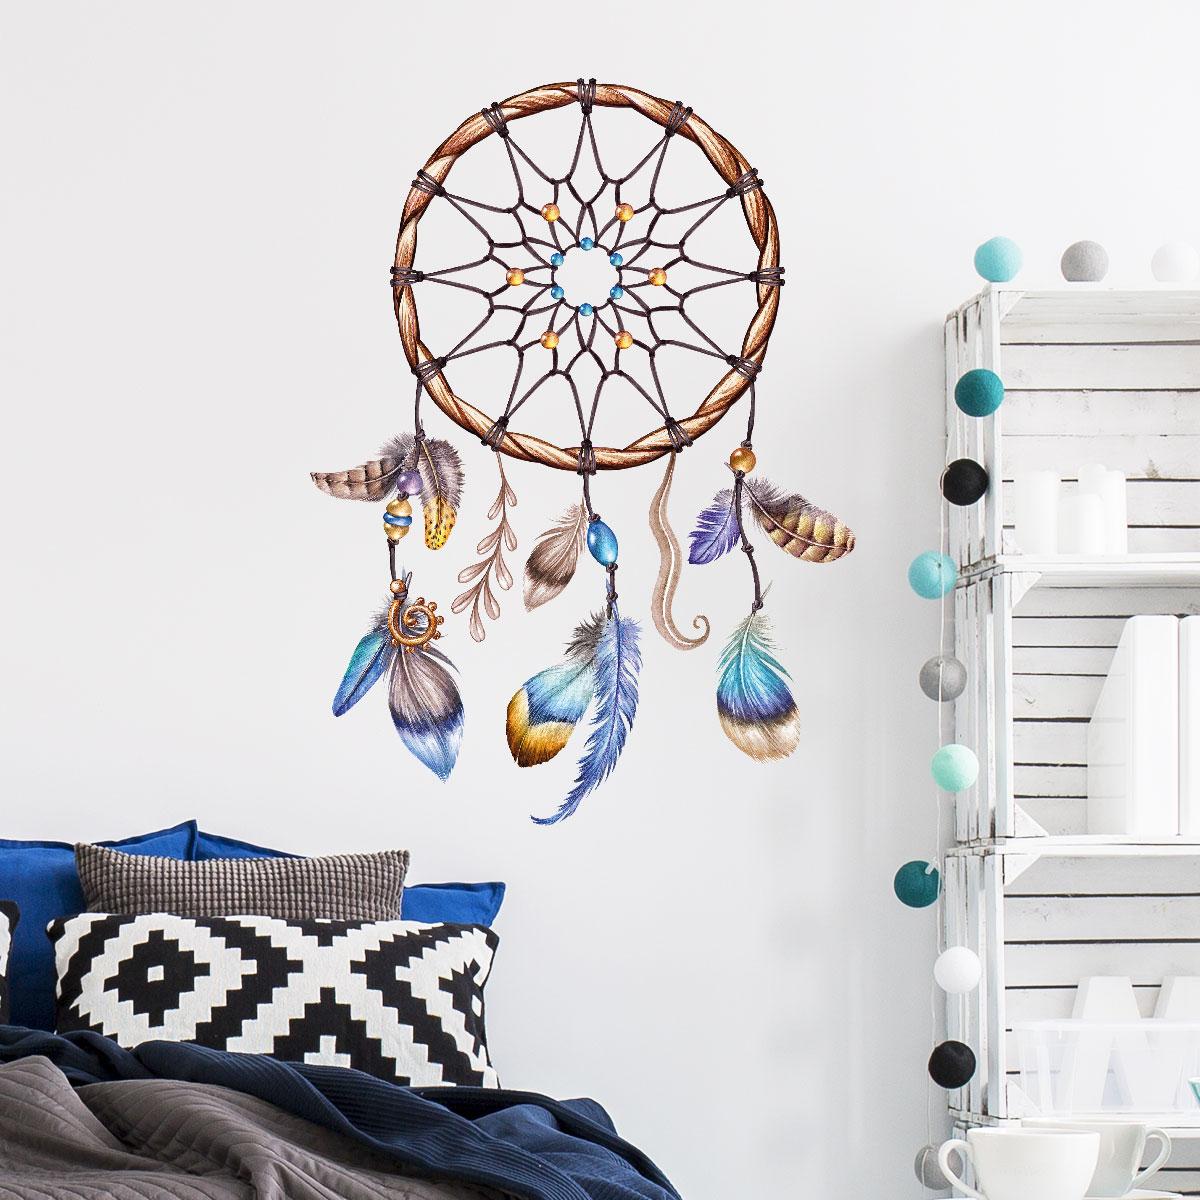 sticker boh me attrape r ves indien stickers chambre ado fille ambiance sticker. Black Bedroom Furniture Sets. Home Design Ideas